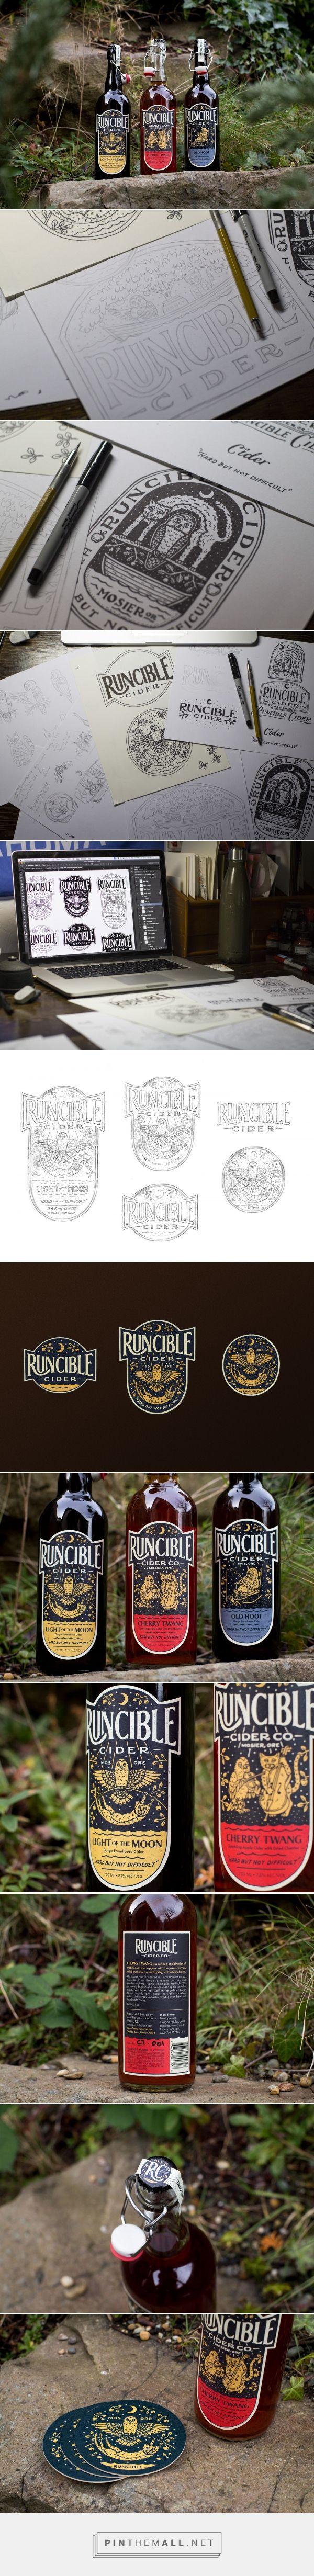 Runcible Cider packaging design illustration by Nathan Yoder - https://www.packagingoftheworld.com/2018/03/runcible-cider.html